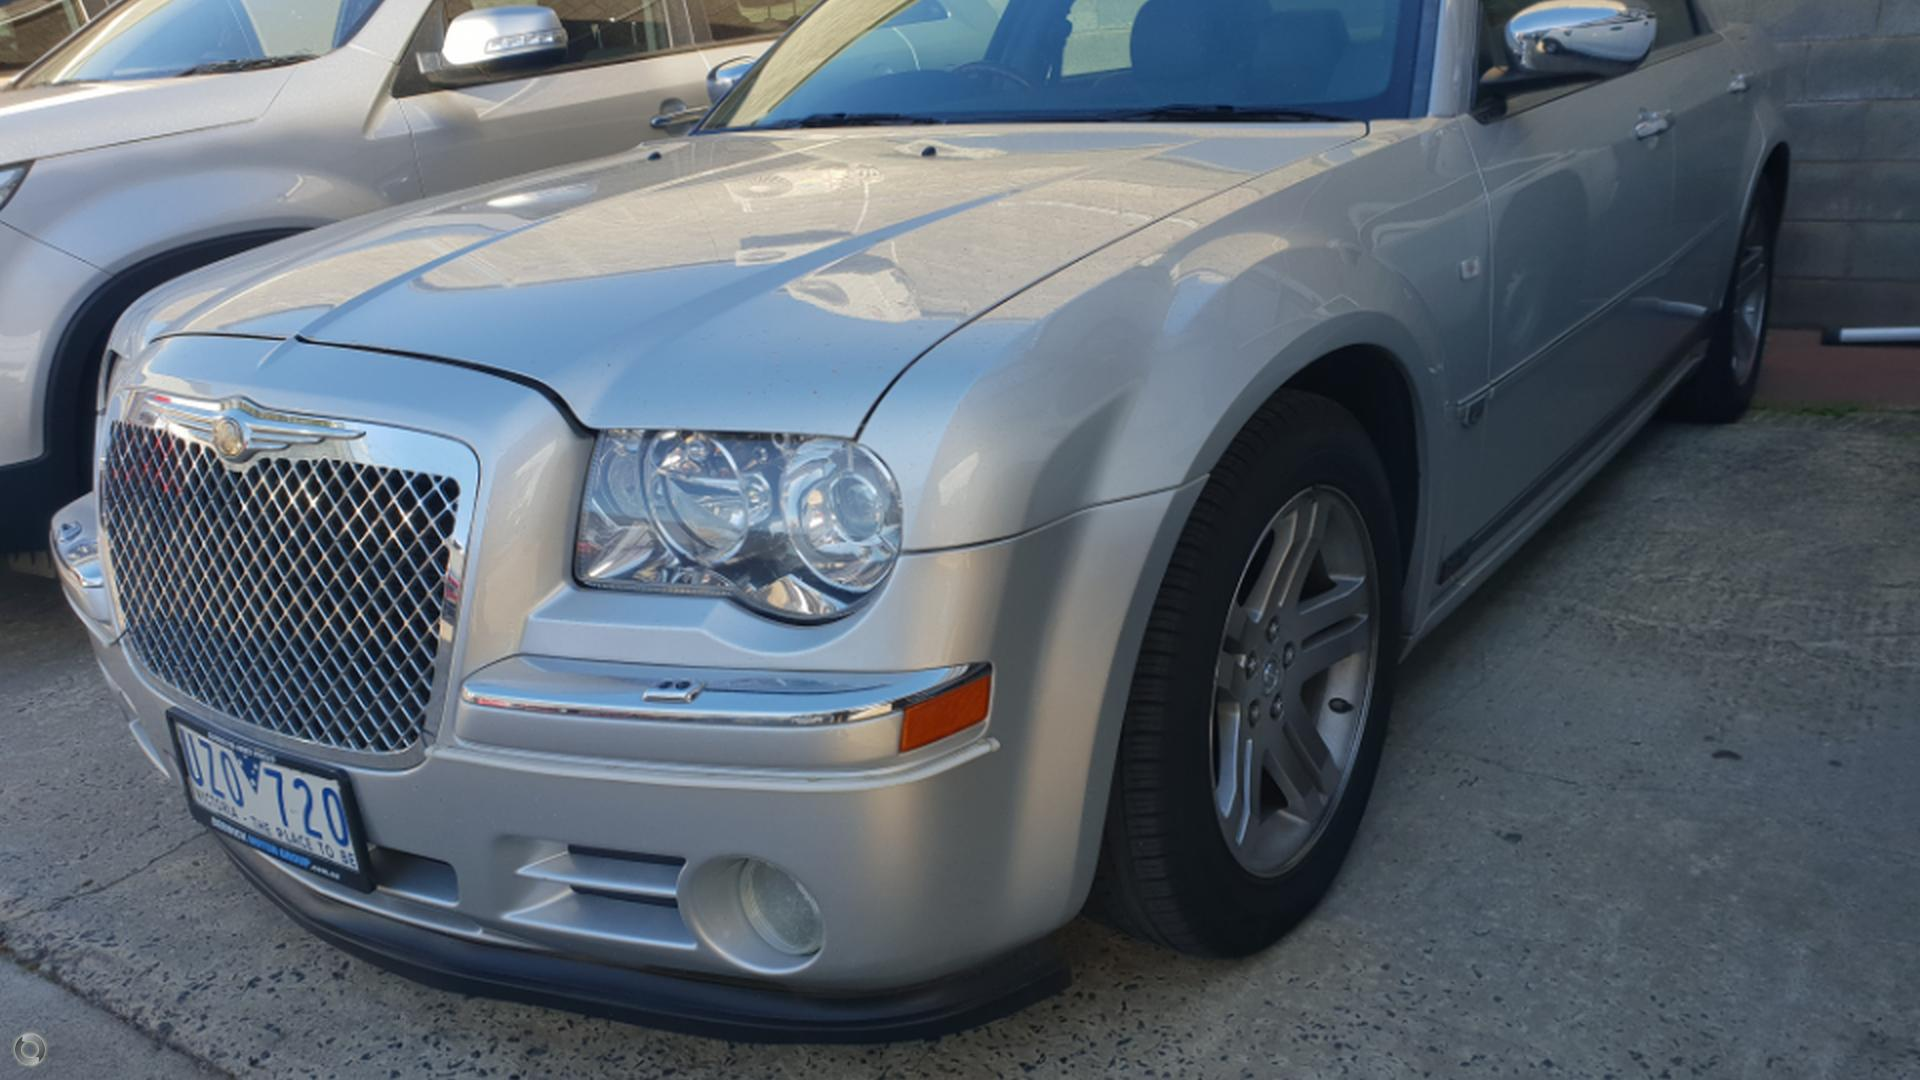 2007 Chrysler 300c HEMI (No Series)